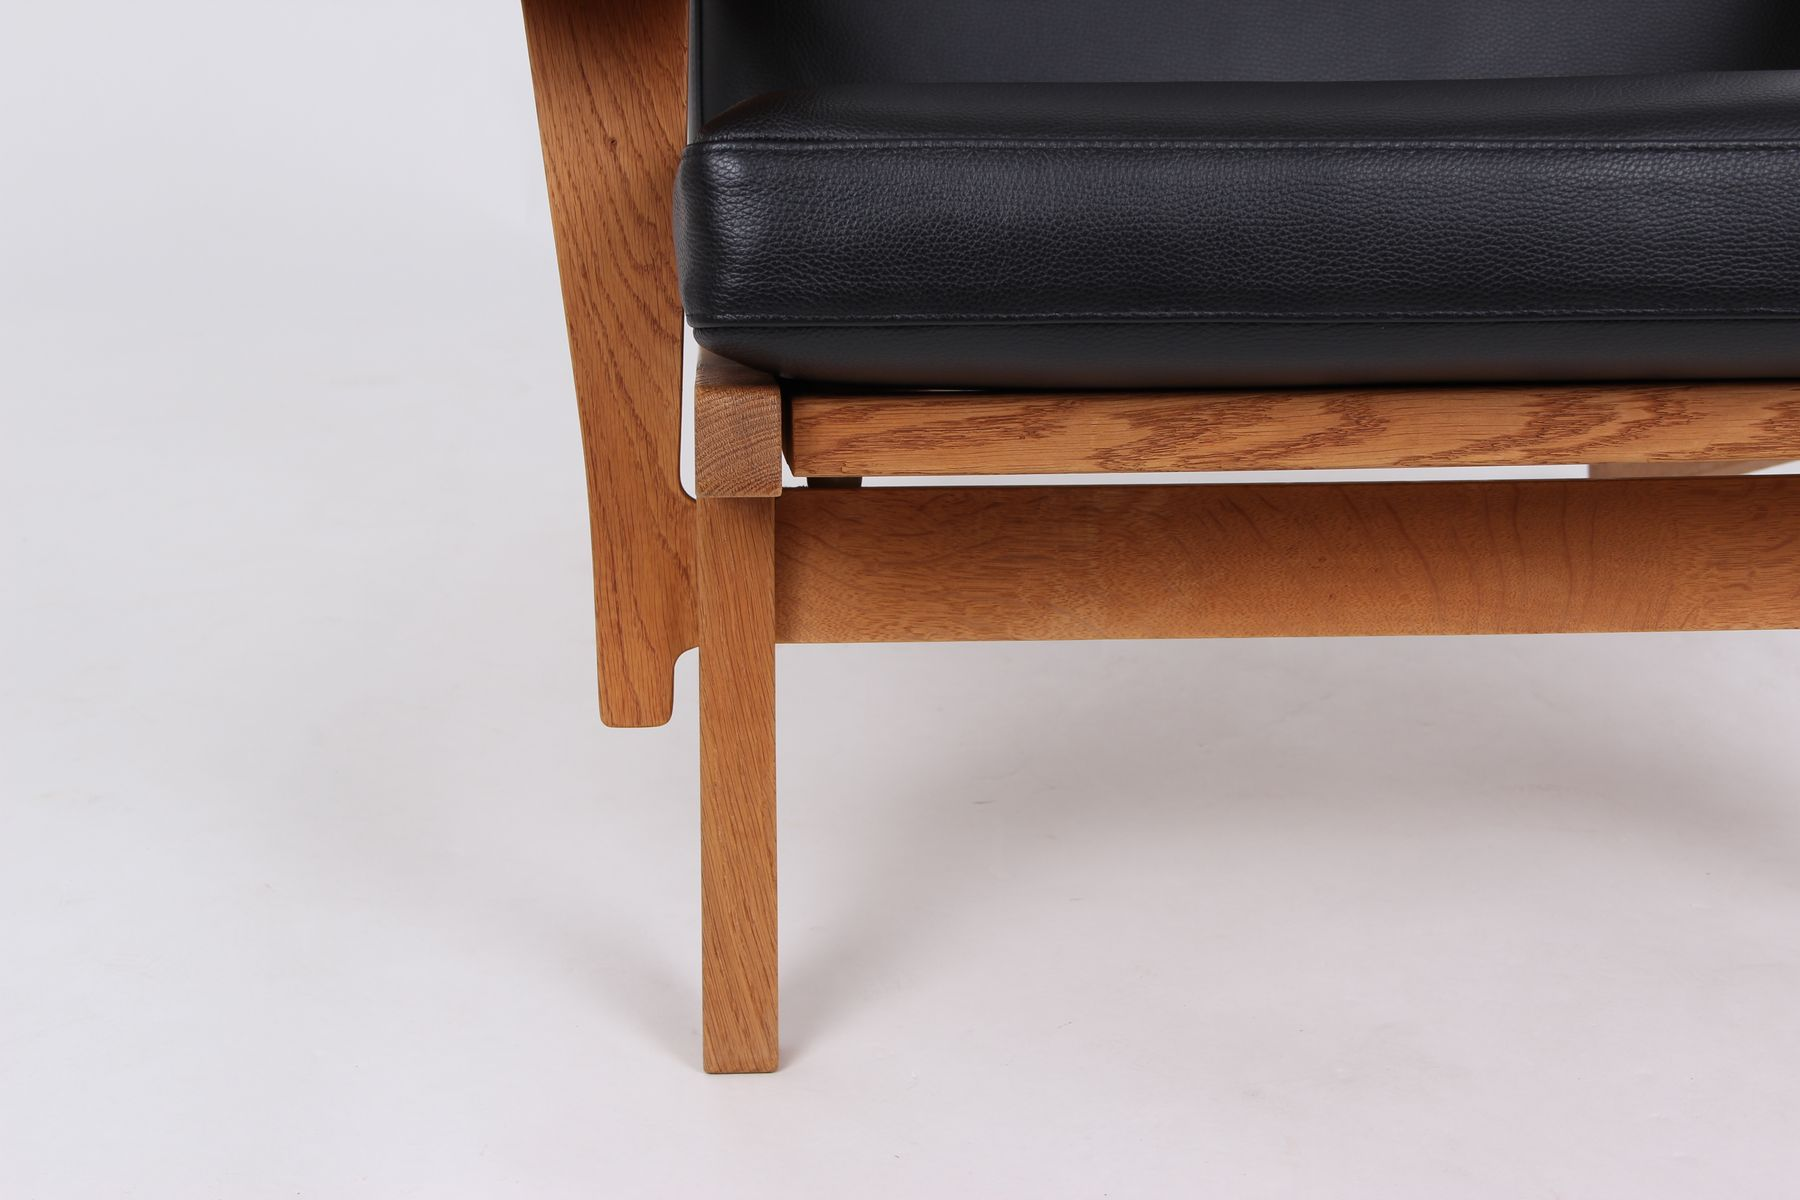 modell ge375 ge375s sessel und hocker aus eiche leder von hans j wegner f r getama 1960er. Black Bedroom Furniture Sets. Home Design Ideas